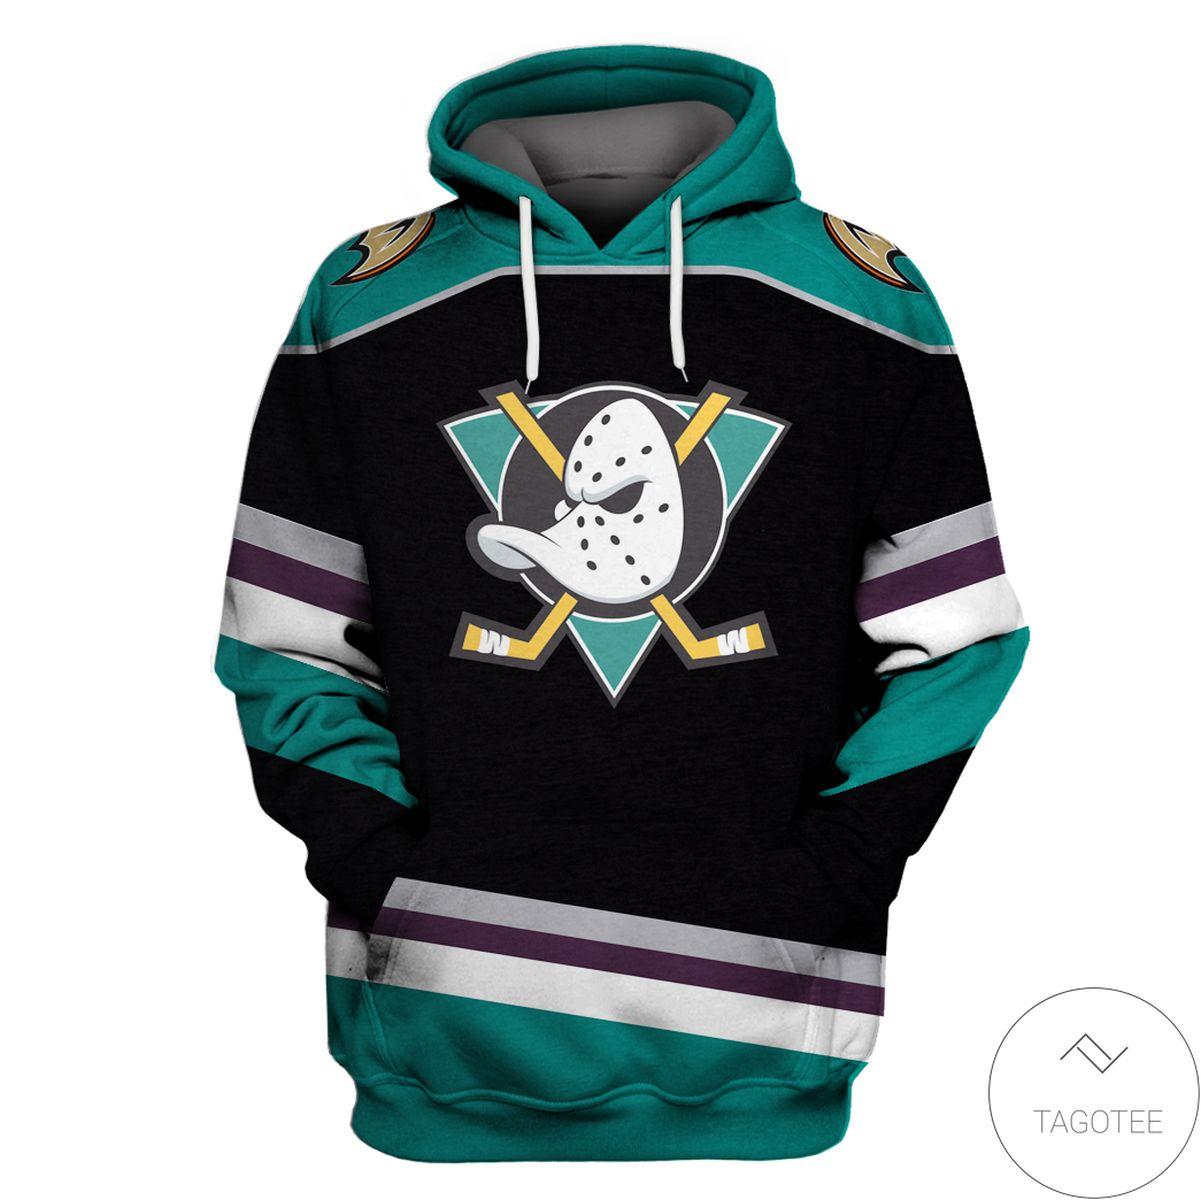 Anaheim Ducks Branded Team 3d Hoodie